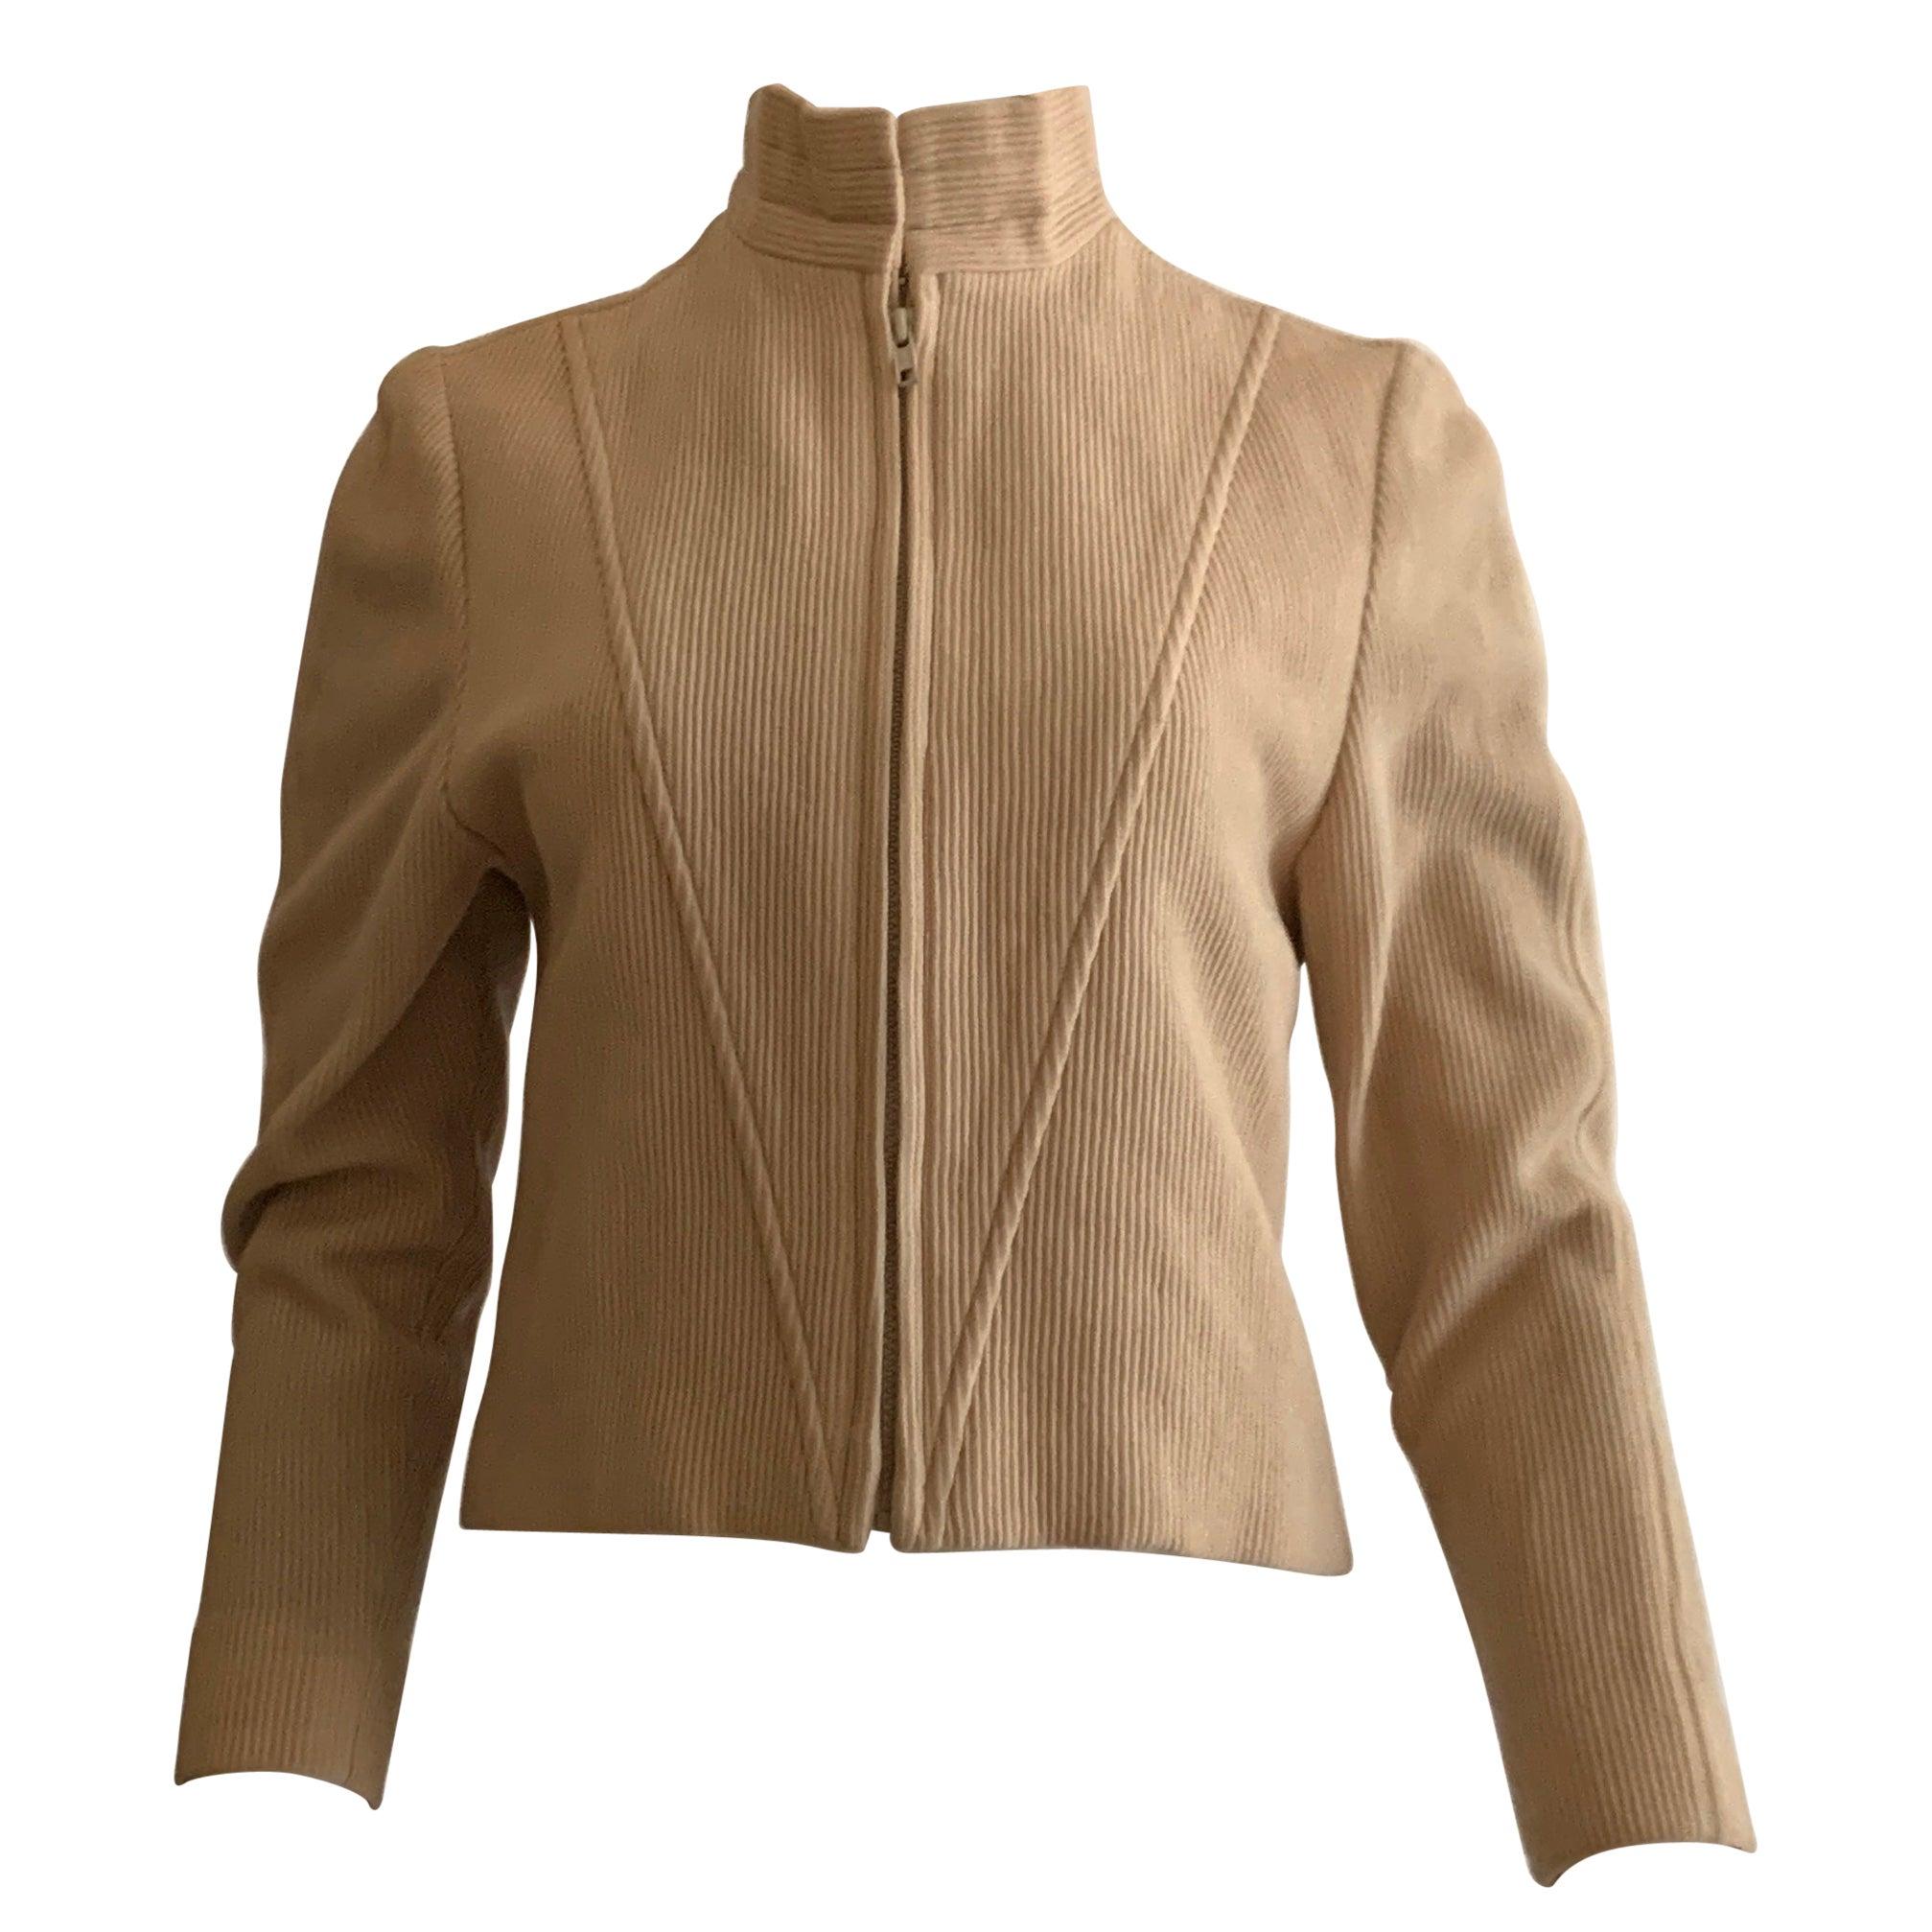 1970s Geoffrey Beene Tan Rib Knit Zip Front Jacket